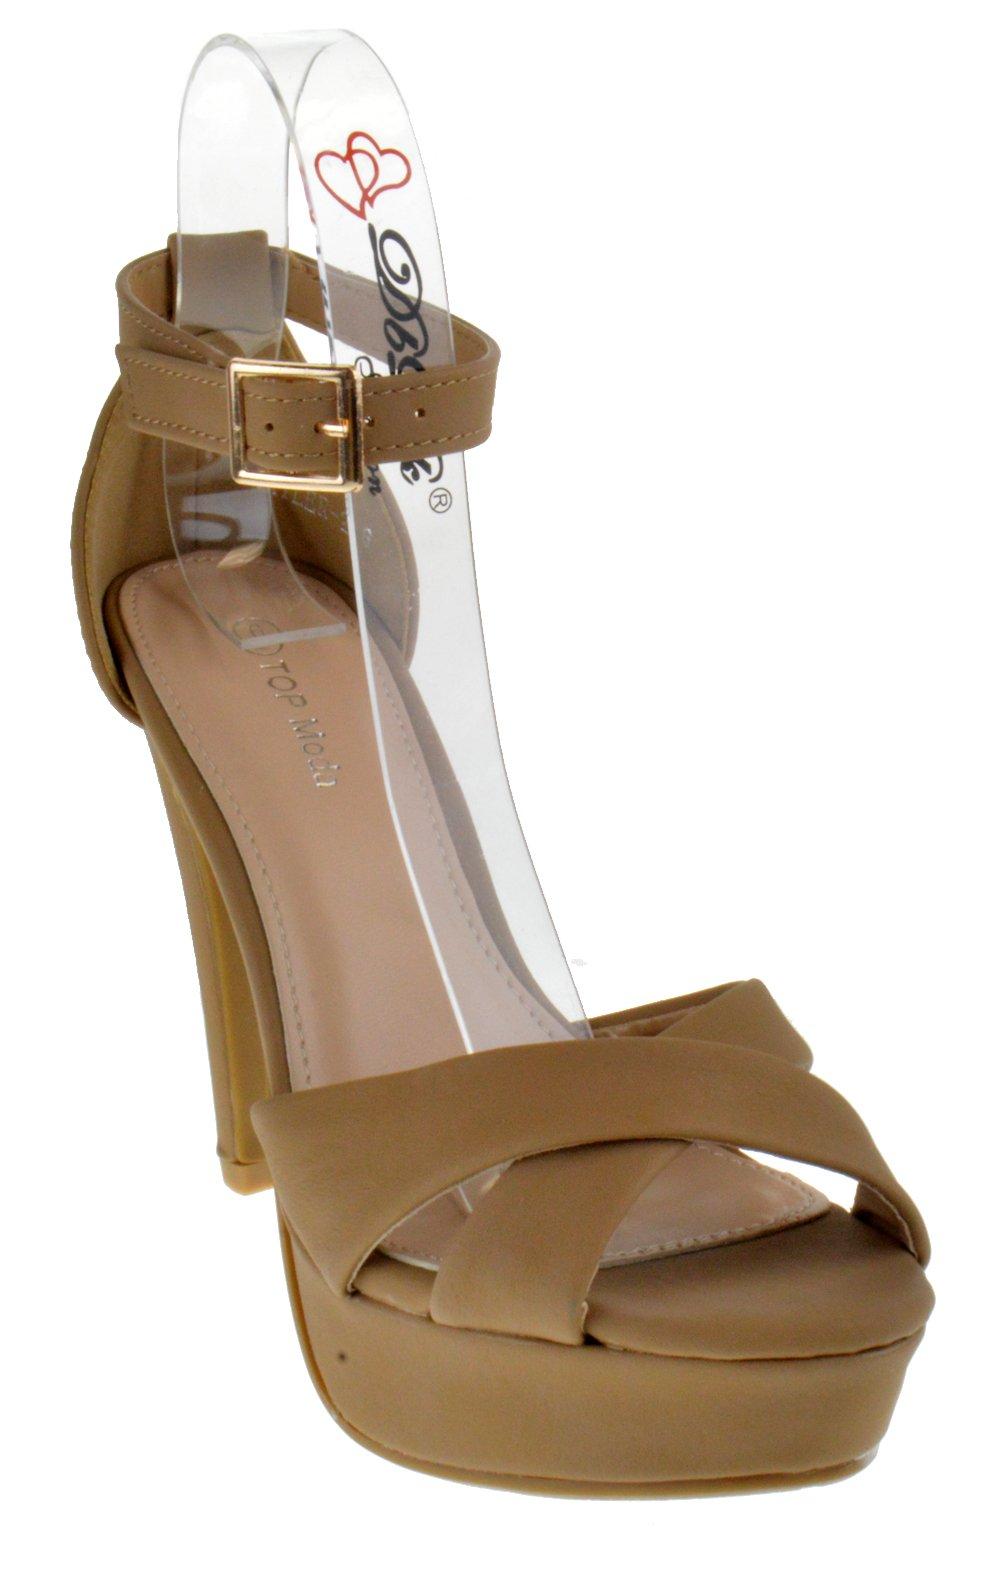 Top Moda Skyler 2 Womens Cross Strap Open Toe Stilletto Heel Platform Sandals Tan 9